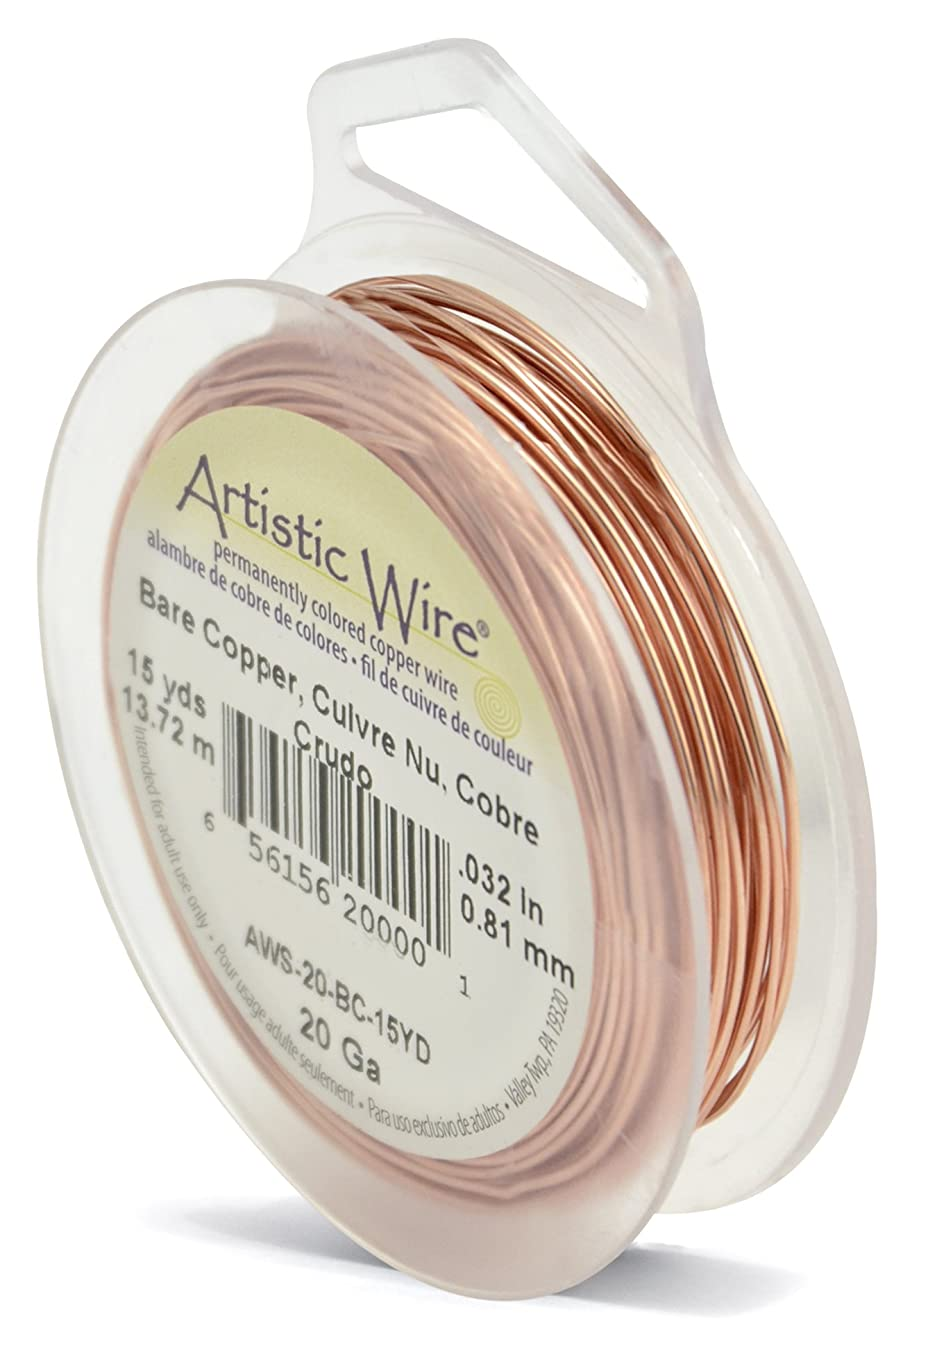 Beadalon Artistic Wire 20-Gauge Bare Copper Wire,15-Yards